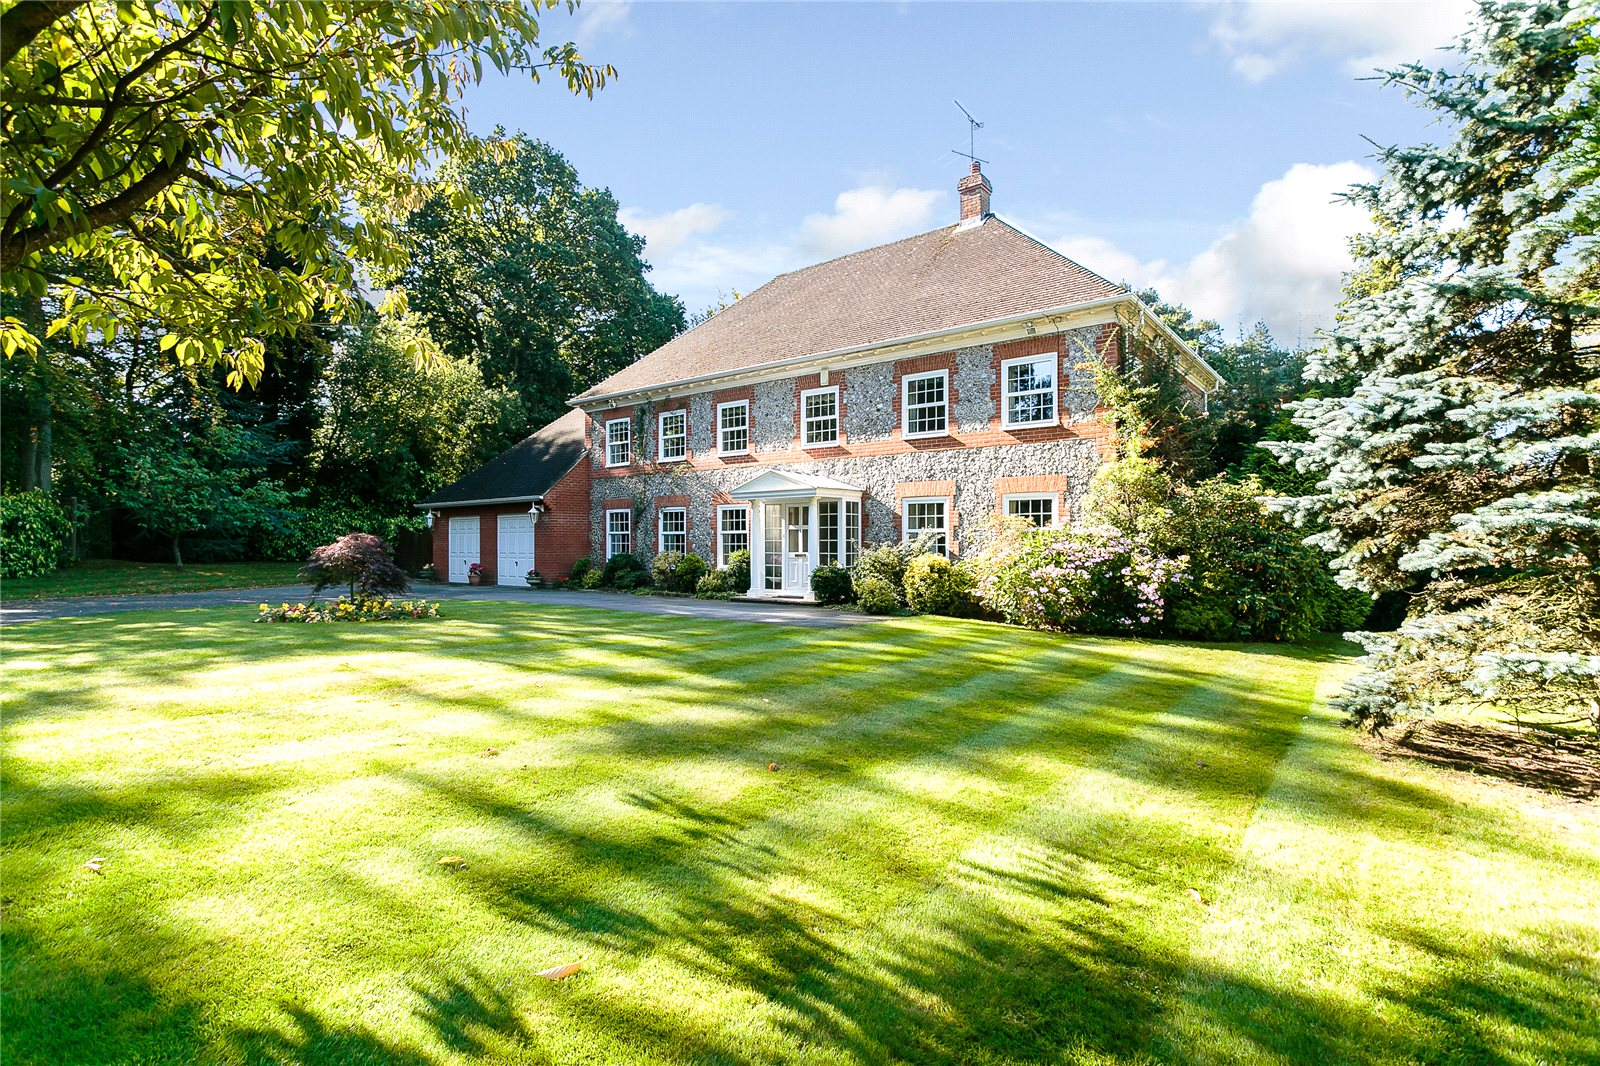 独户住宅 为 销售 在 Woodpecker Close, Ewshot, Farnham, Surrey, GU10 Farnham, 英格兰